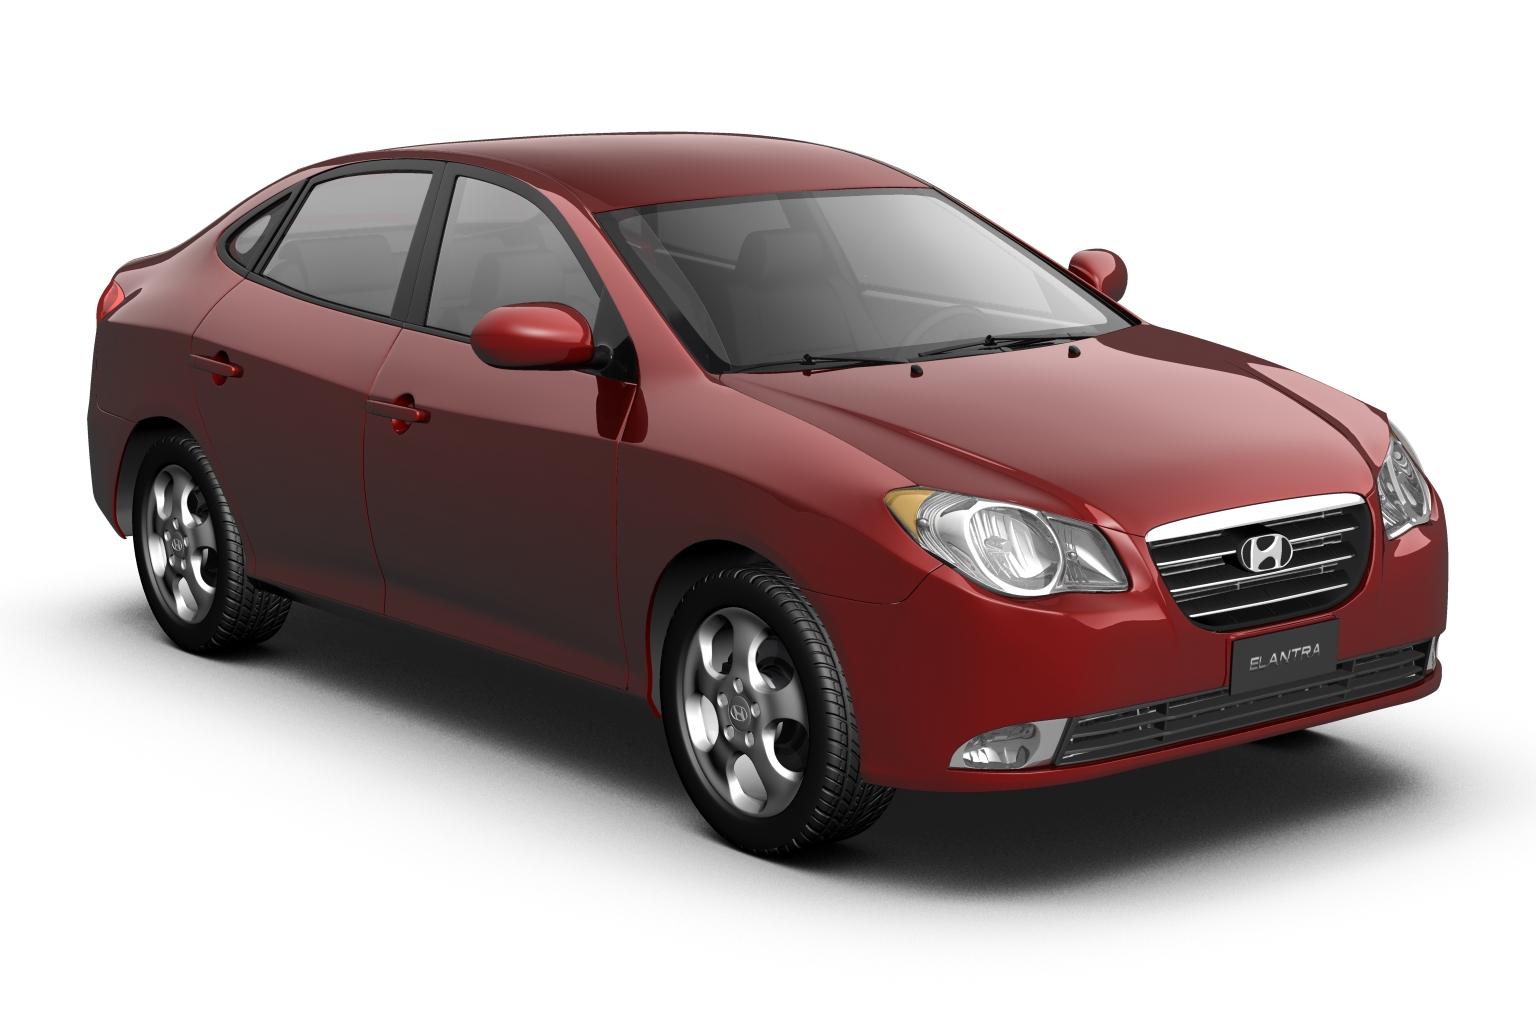 2007 hyundai elantra (avante) Model 3d 3ds max fbx lwo hrc xsi obj 205408